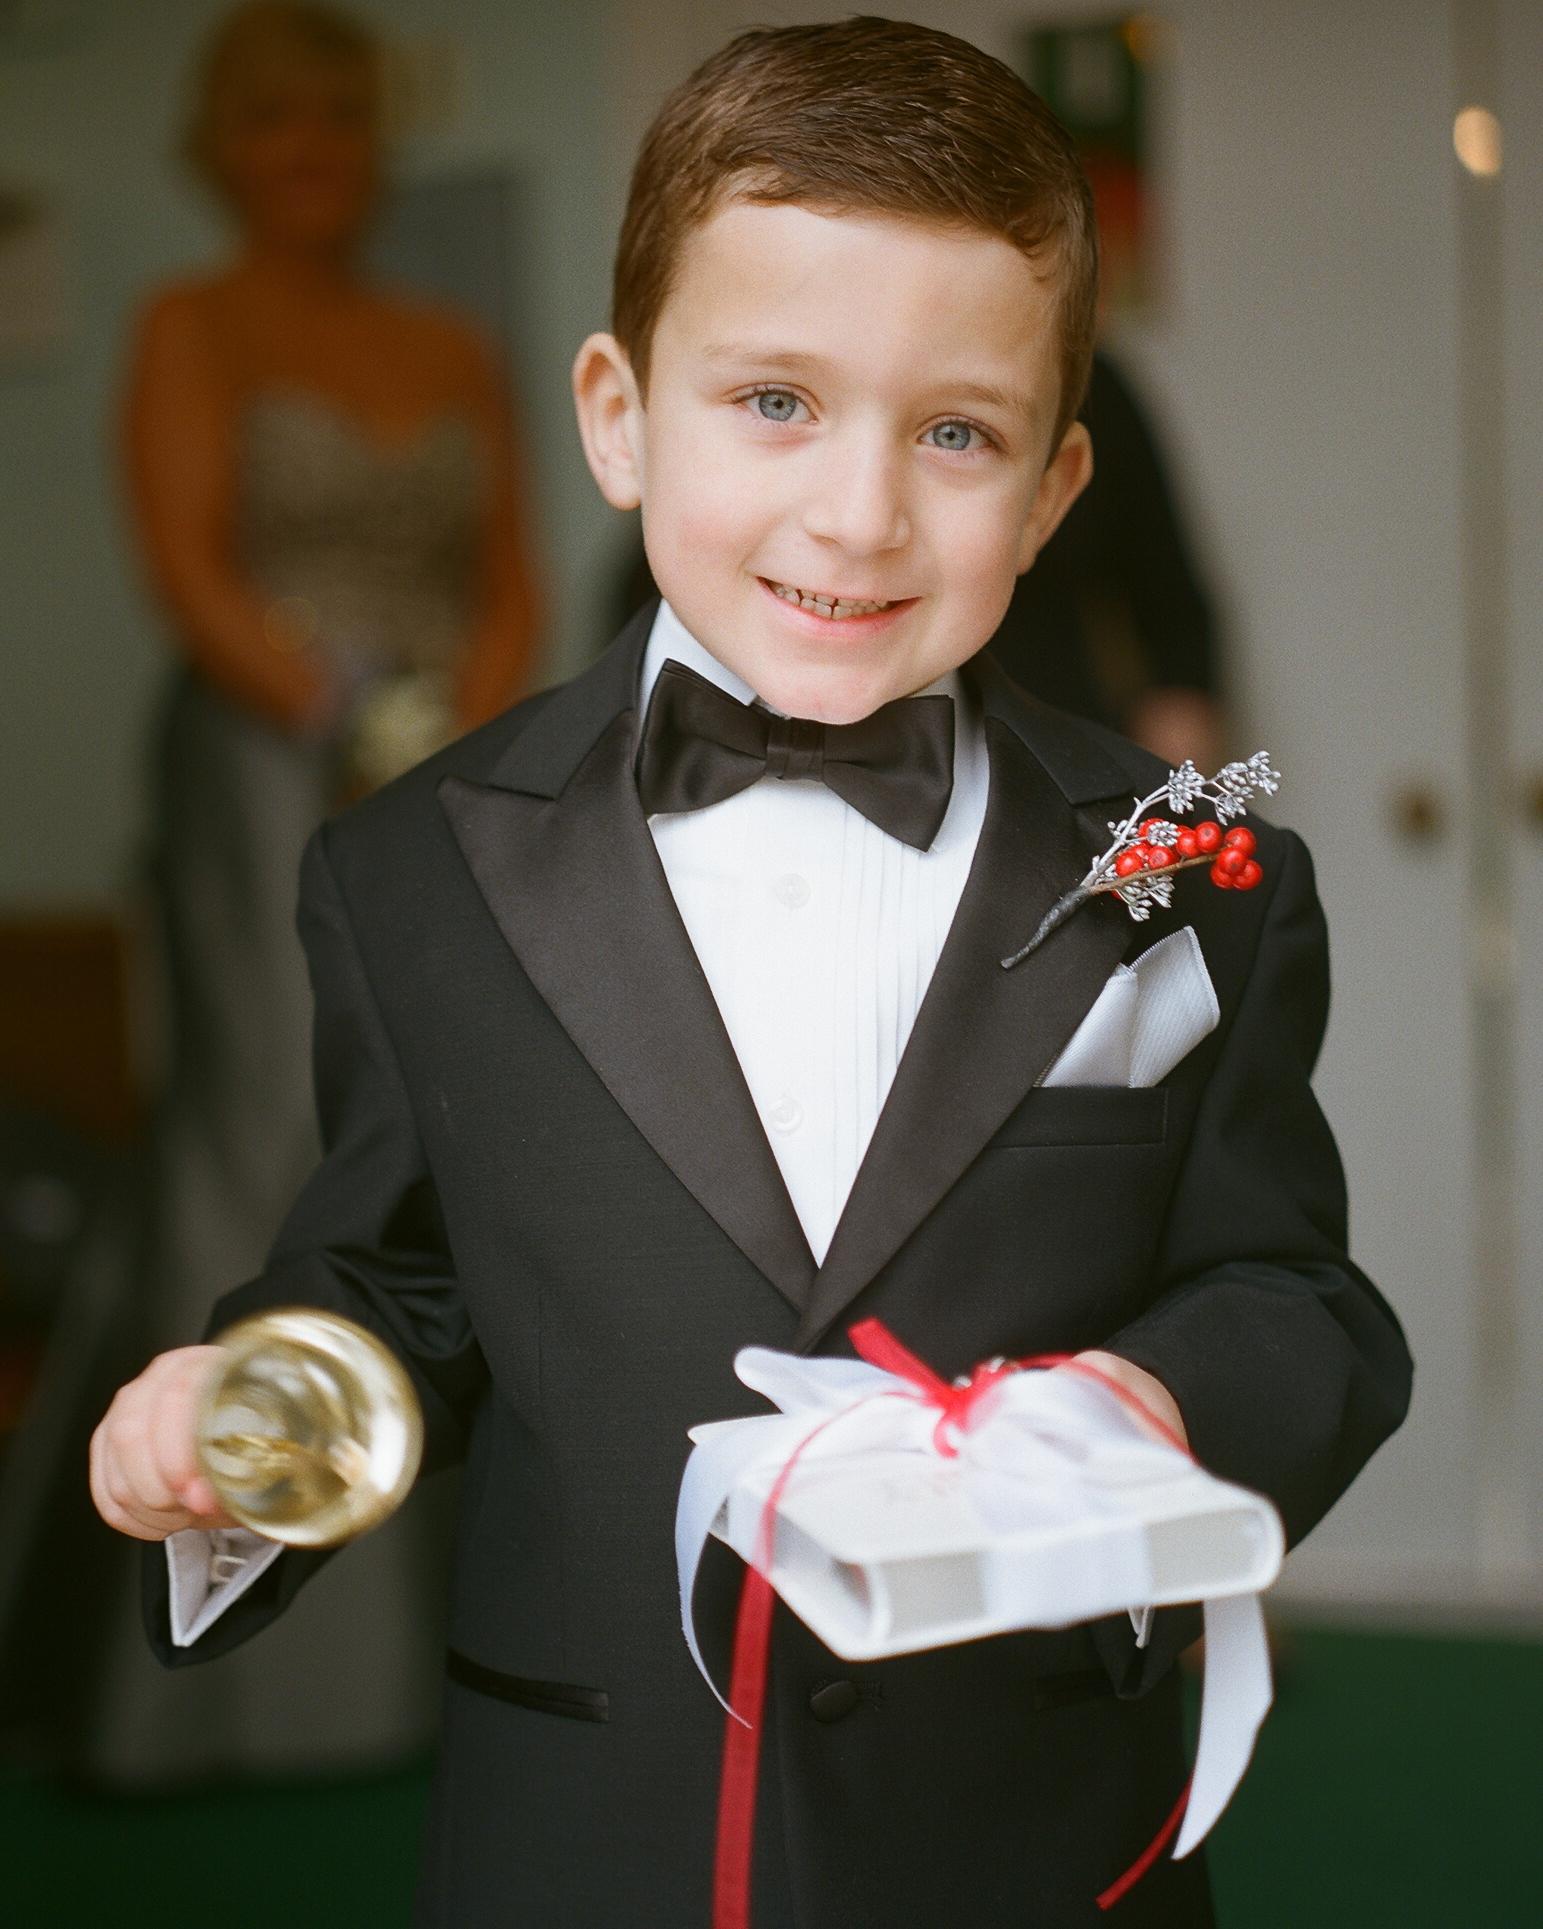 paige-michael-wedding-ringbearer-0621-s112431-1215.jpg